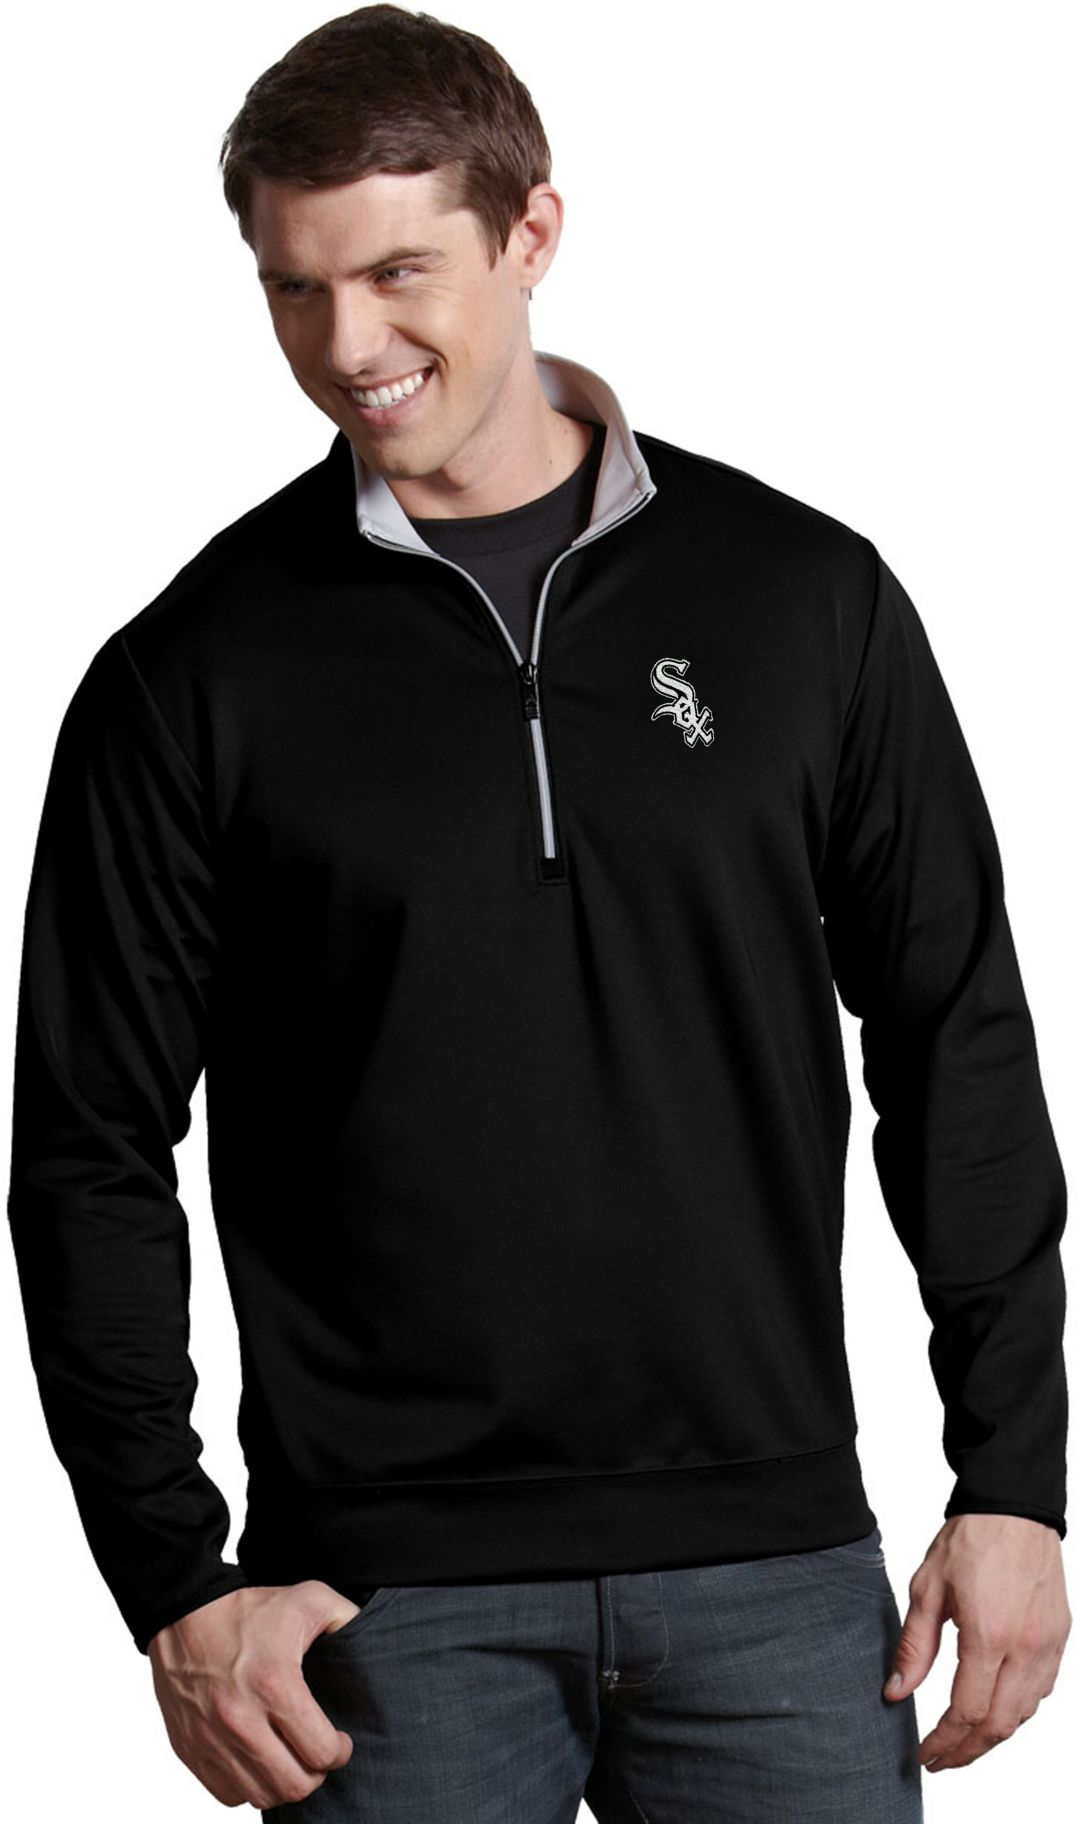 various colors 58f77 78b62 Antigua Men's Chicago White Sox Leader Black Quarter-Zip Pullover